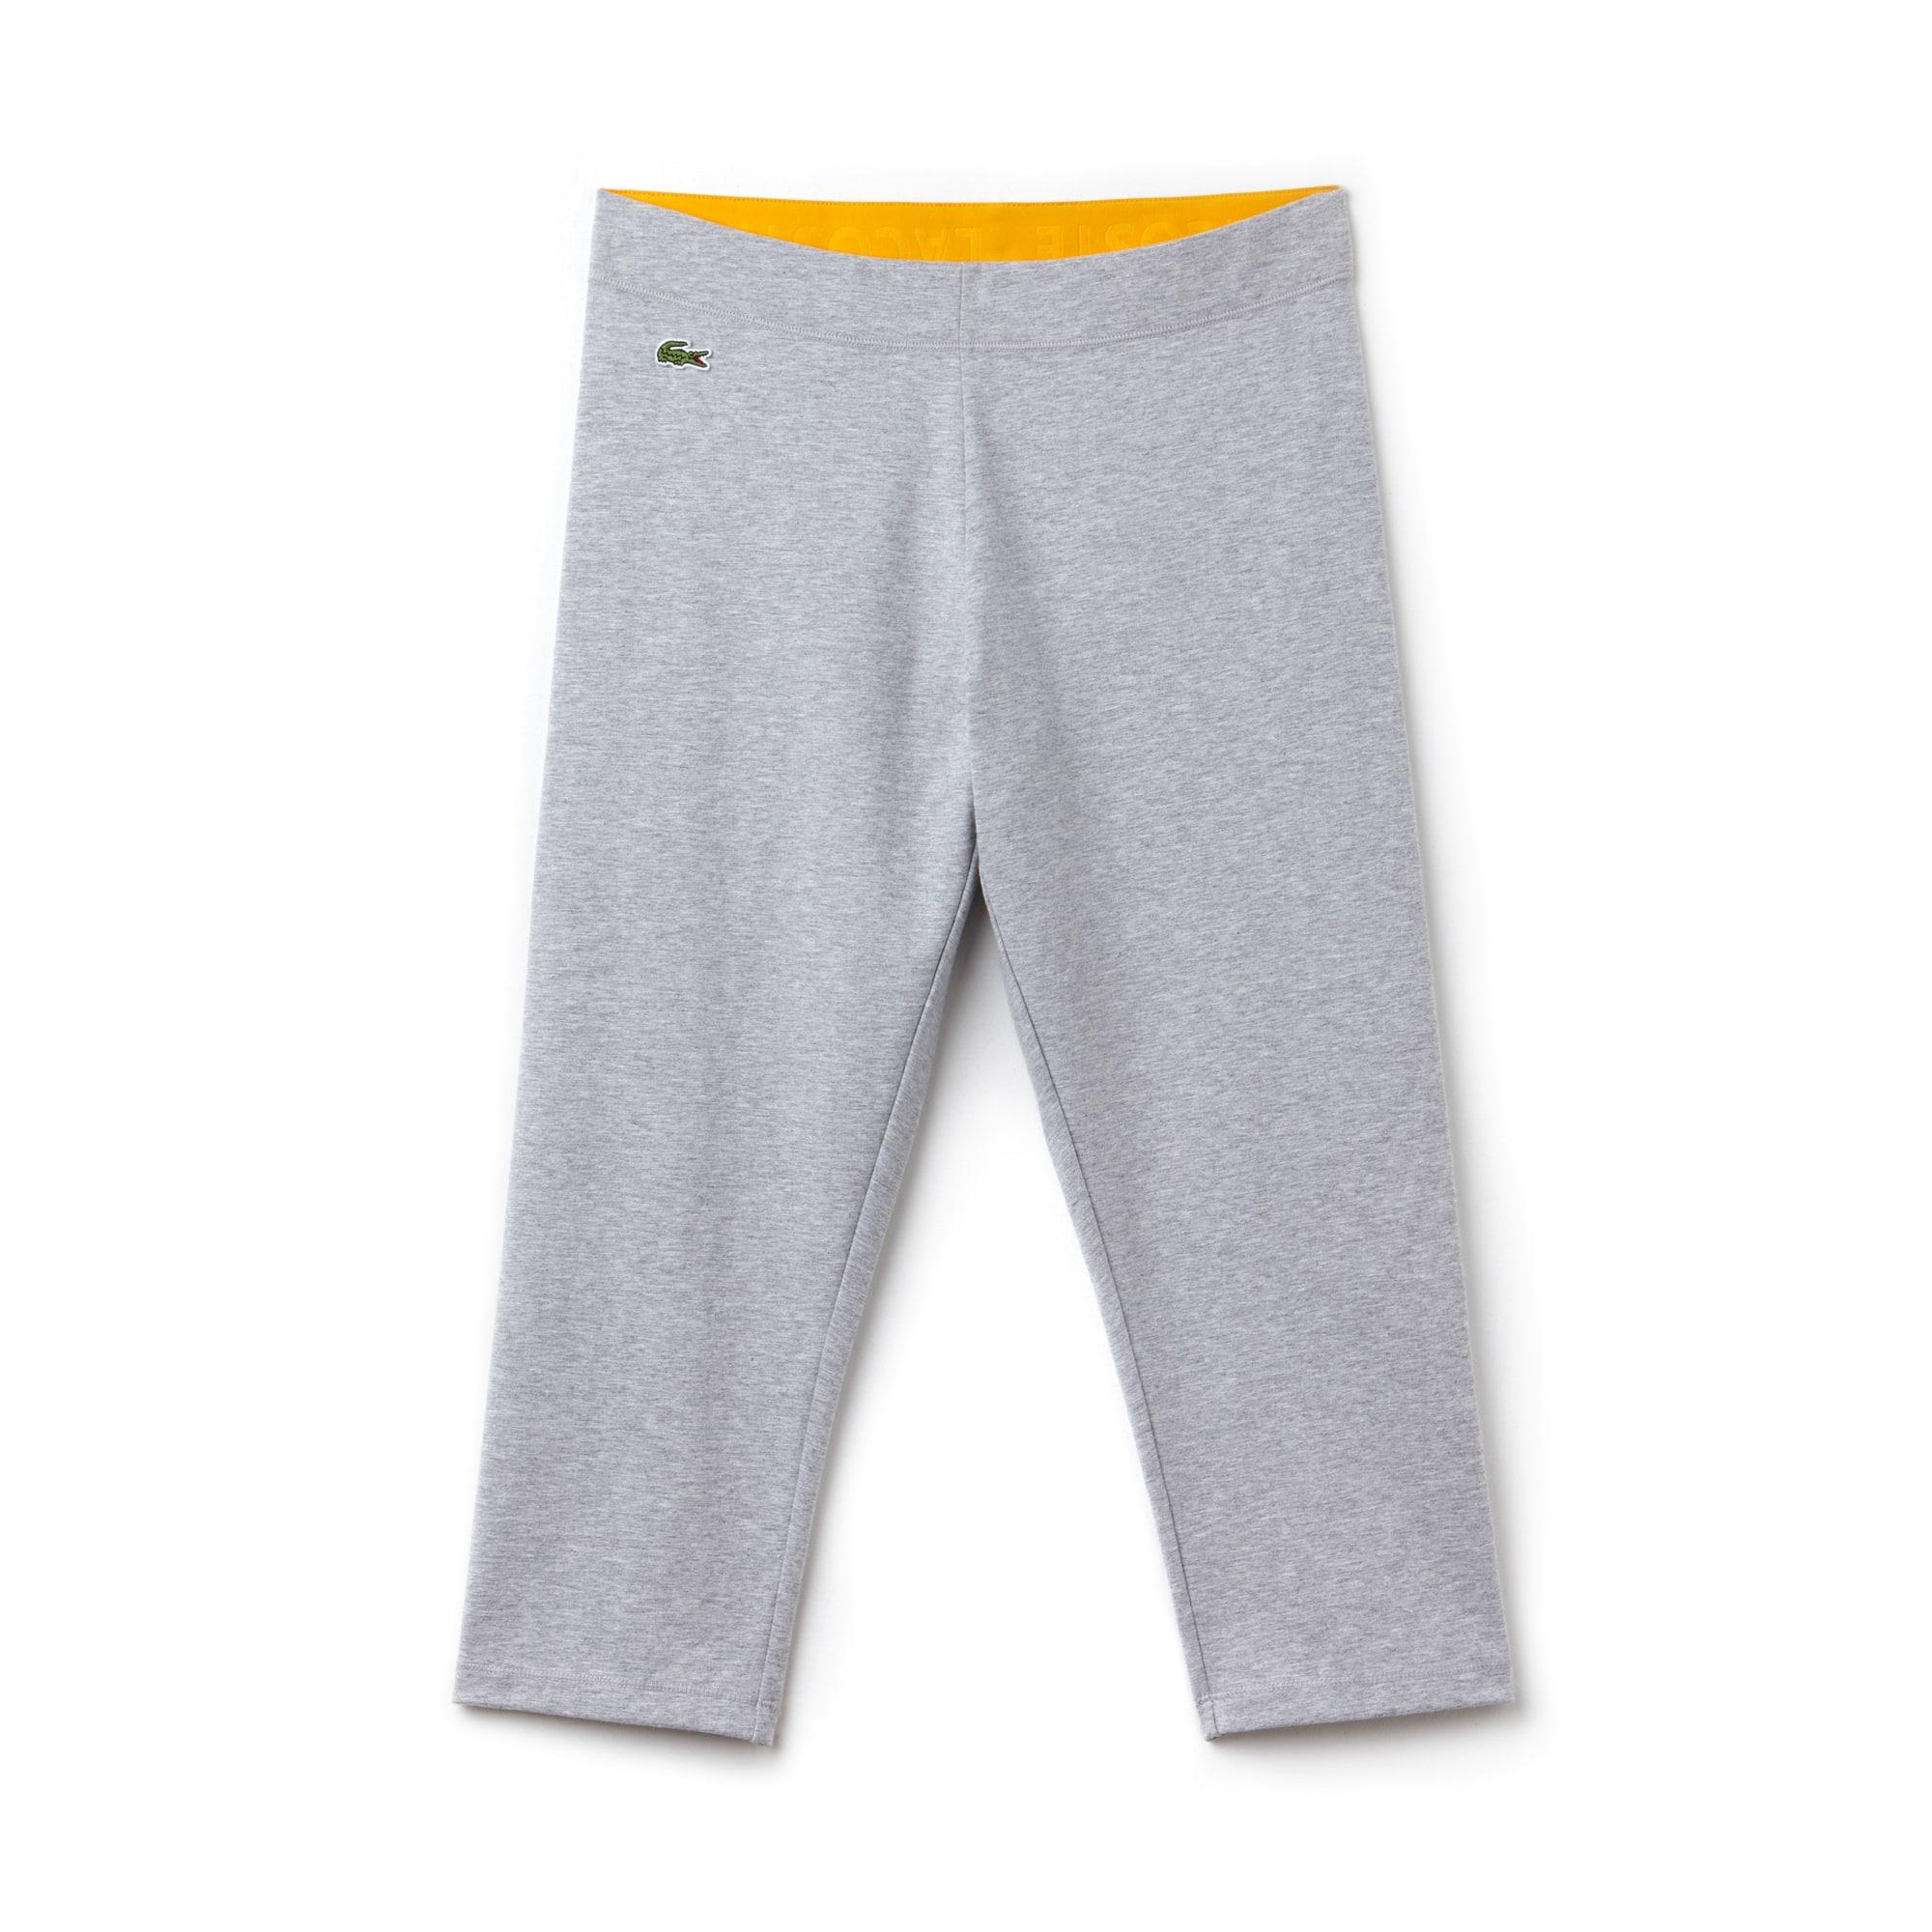 Leggings Tennis Lacoste SPORT in jersey stretch tinta unita